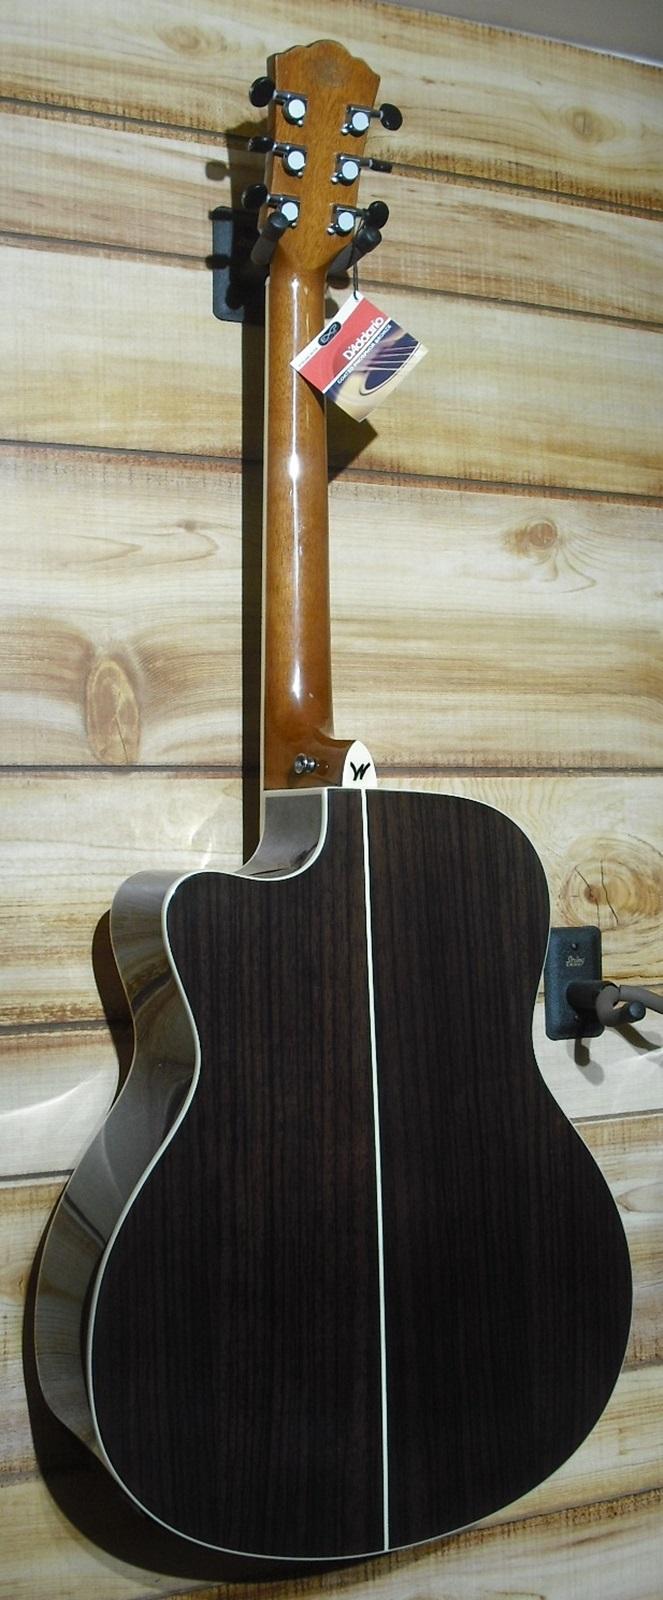 washburn ag20ce grand auditorium acoustic electric guitar natural w case. Black Bedroom Furniture Sets. Home Design Ideas